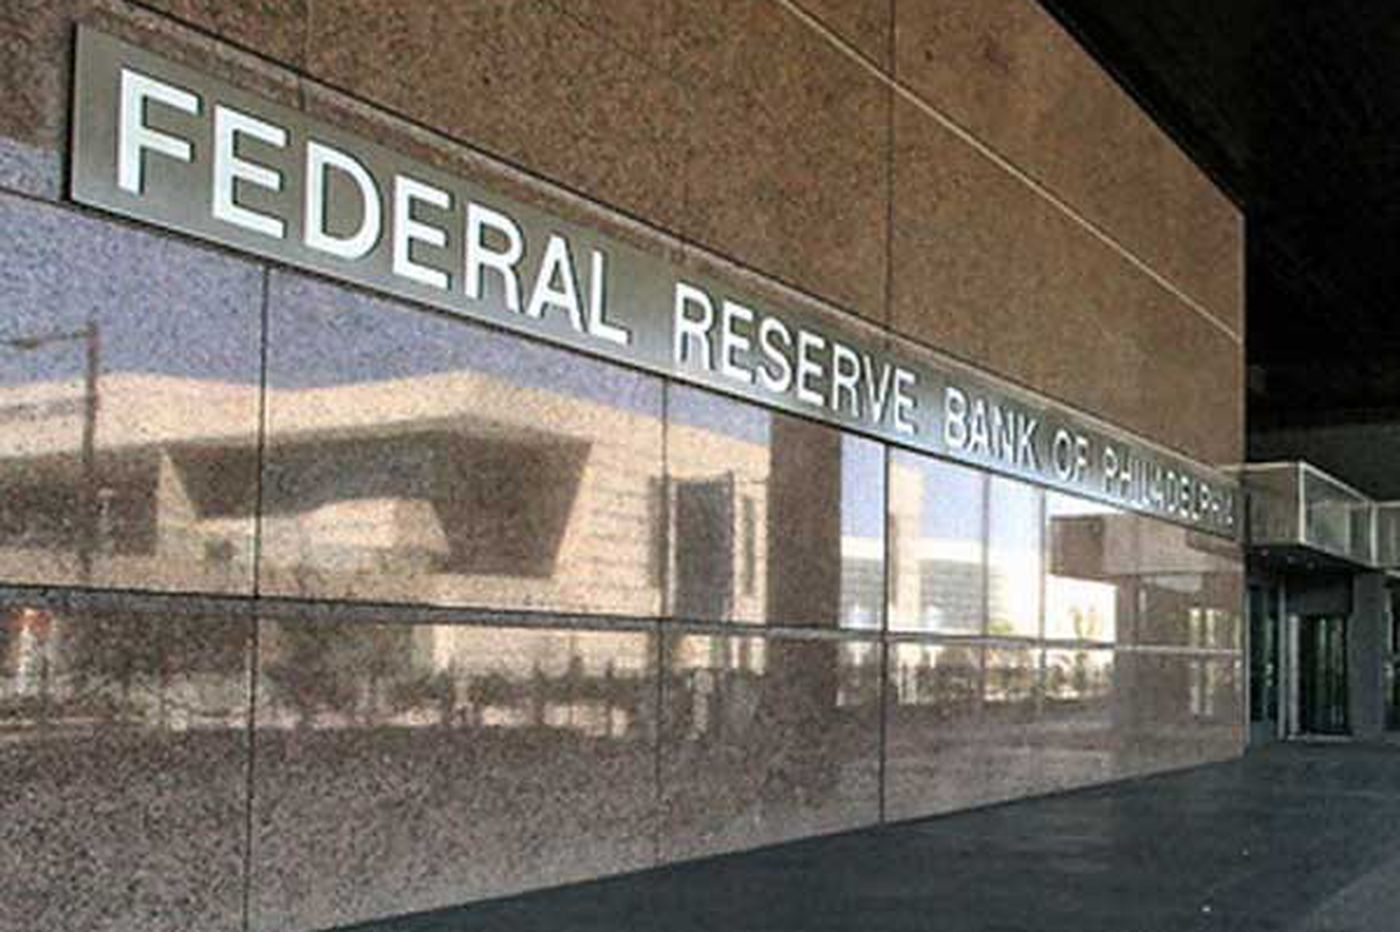 Fed: Phila. region's economy slipped in January, February